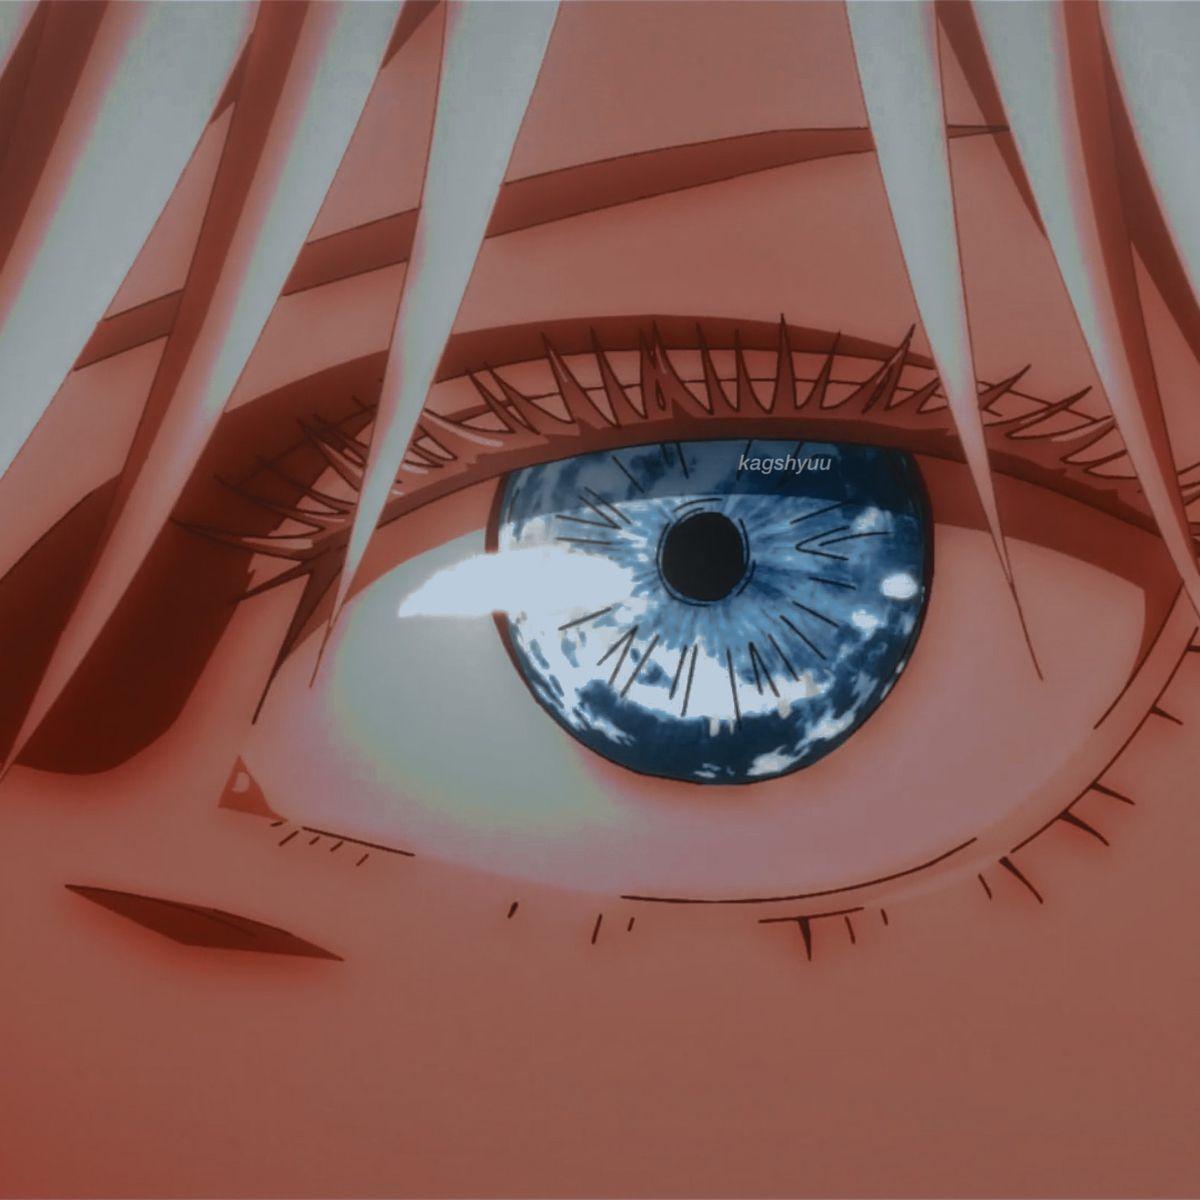 Gojo Satoru Eyes Wallpaper Anime Wallpaper Live Anime Eyes